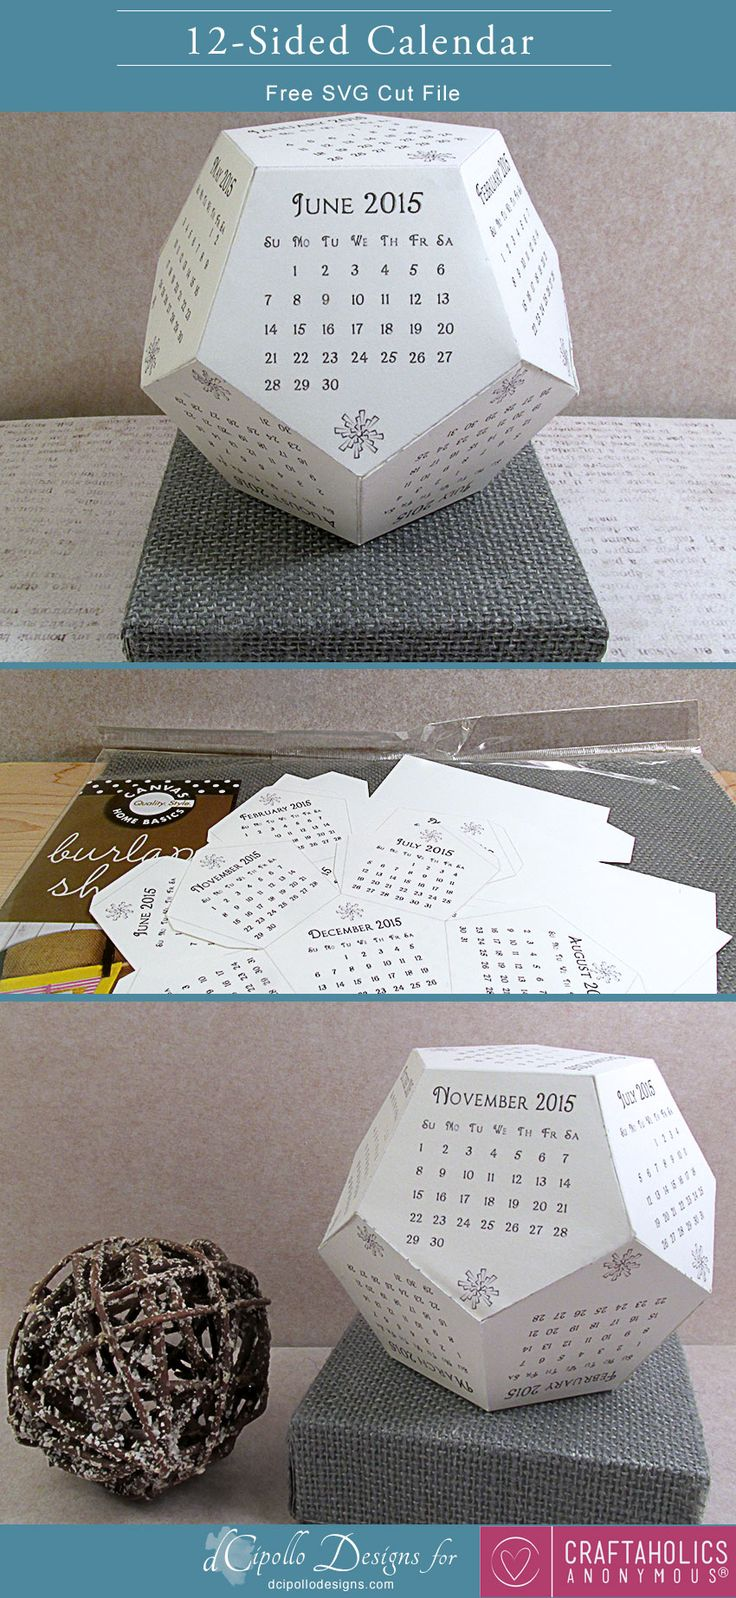 12 Sided Calendar: Free SVG Cut File | Craftaholics Anonymous®